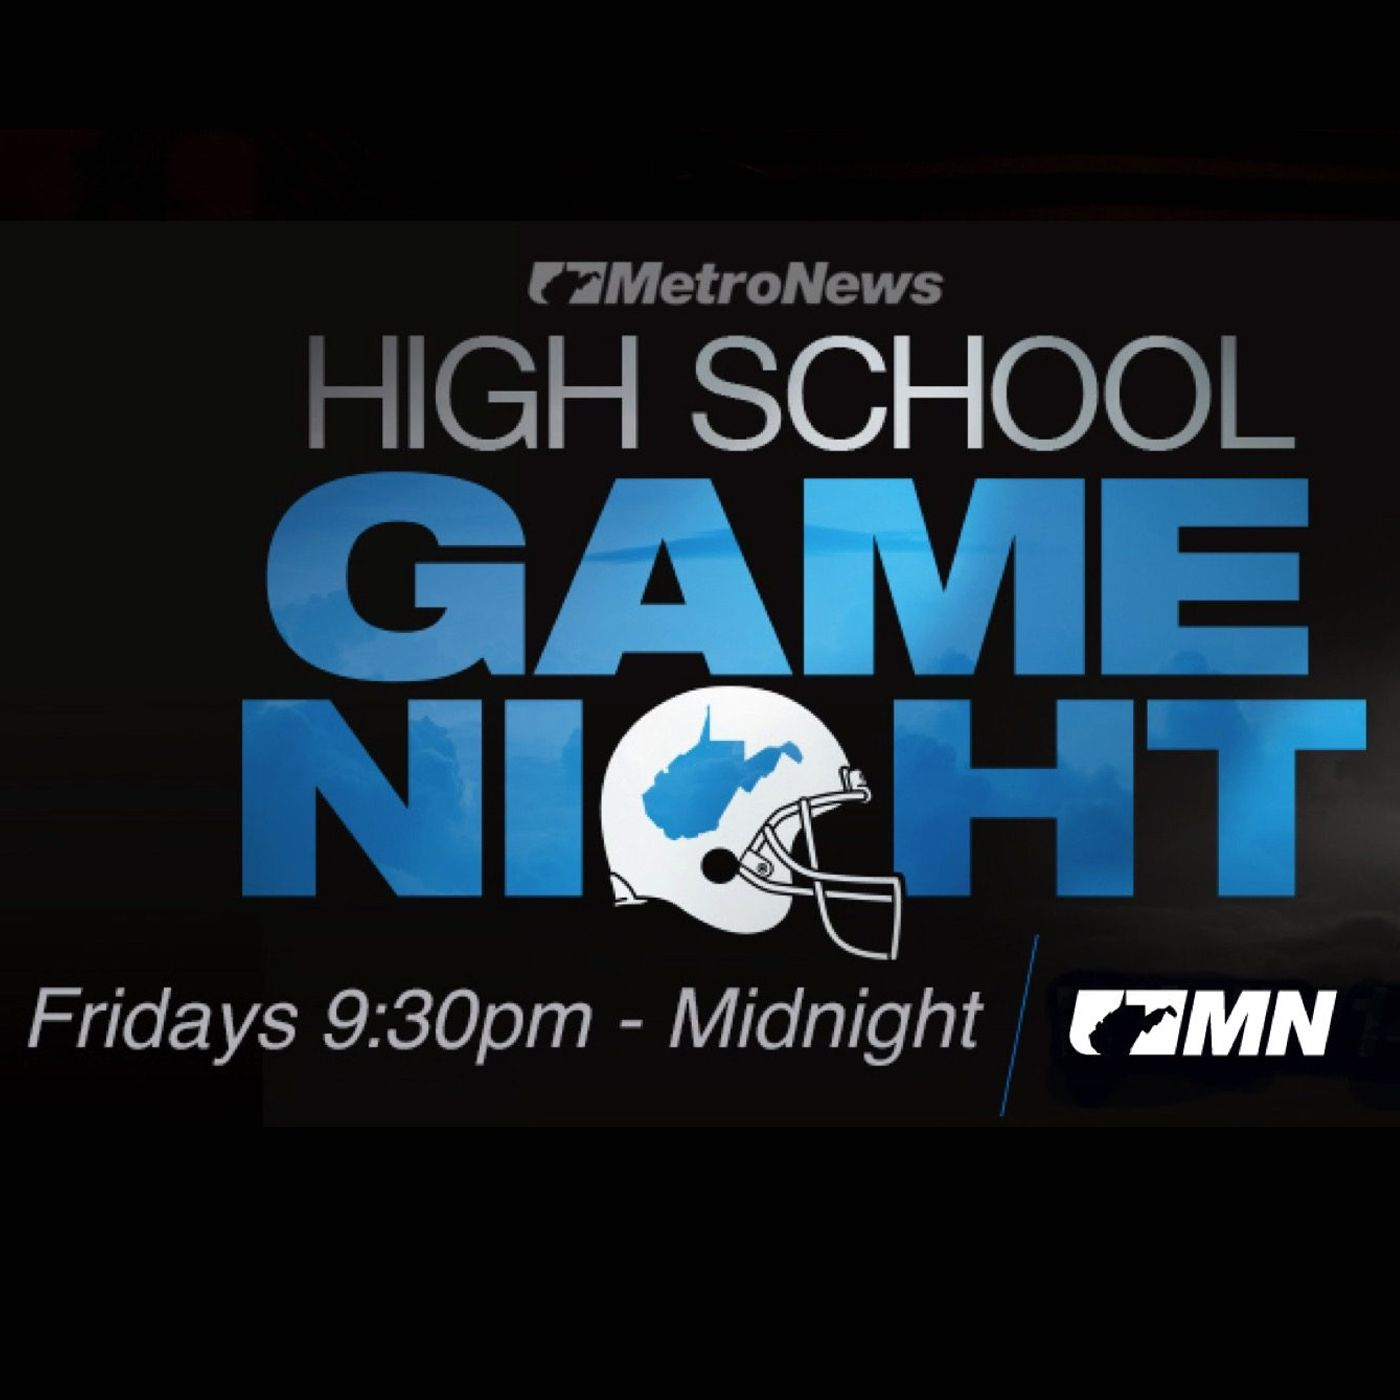 High School Game Night 11-28-20